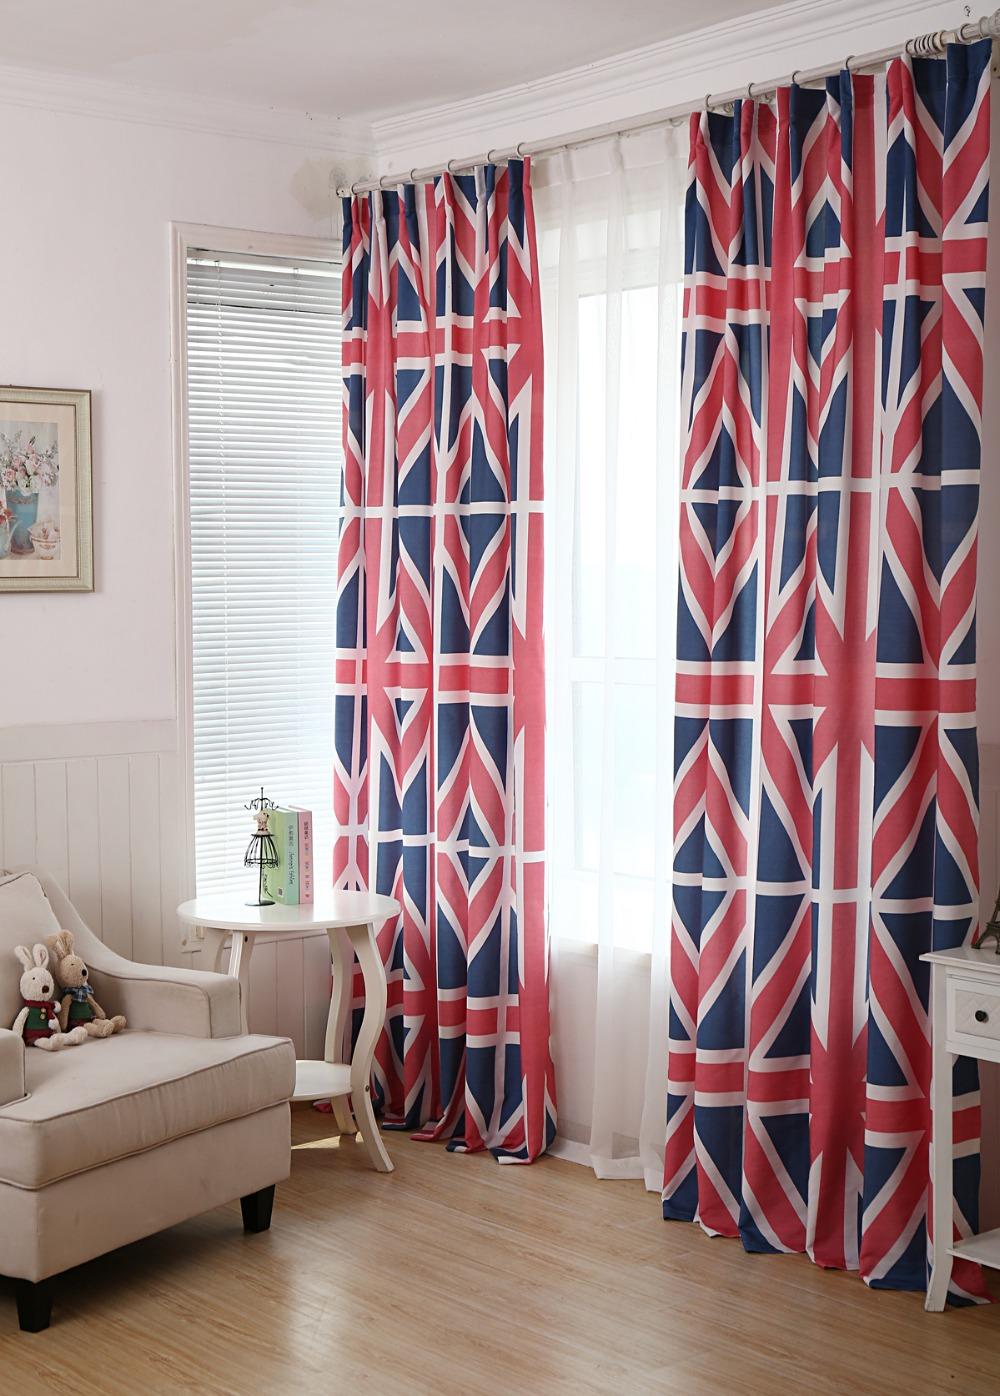 Chambre coucher style anglais enchanteur chambre coucher style anglais avec reine neiges style - Chambre a coucher style anglais ...